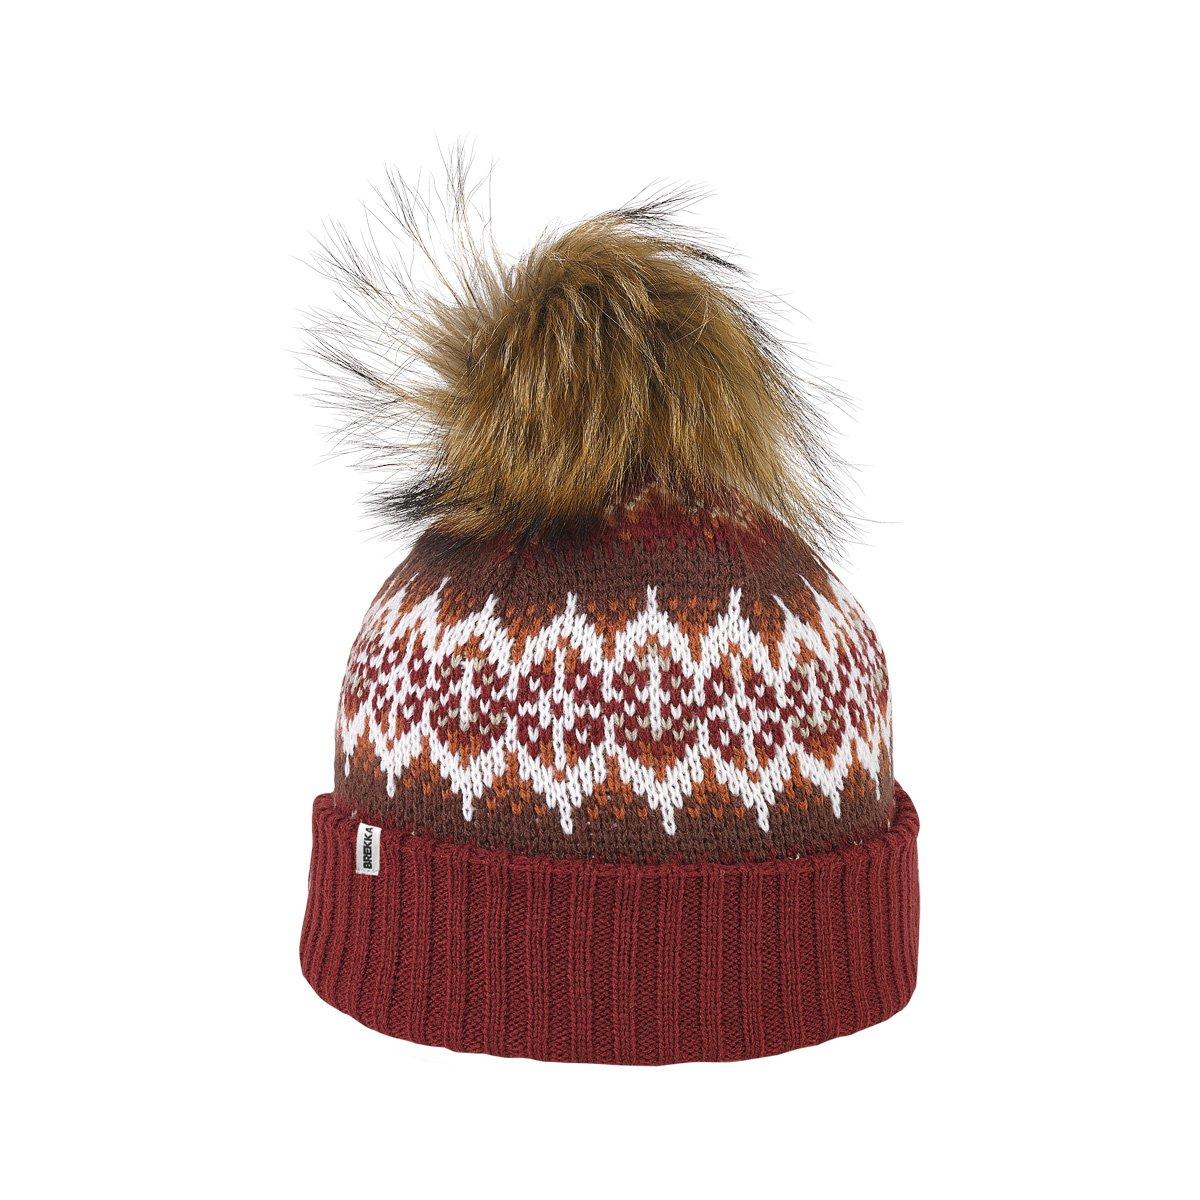 Brekka berretto con pompon, Yorkshire Racoon Pon, Donna, Bommelmütze Yorkshire Racoon Pon, Burgundi,...